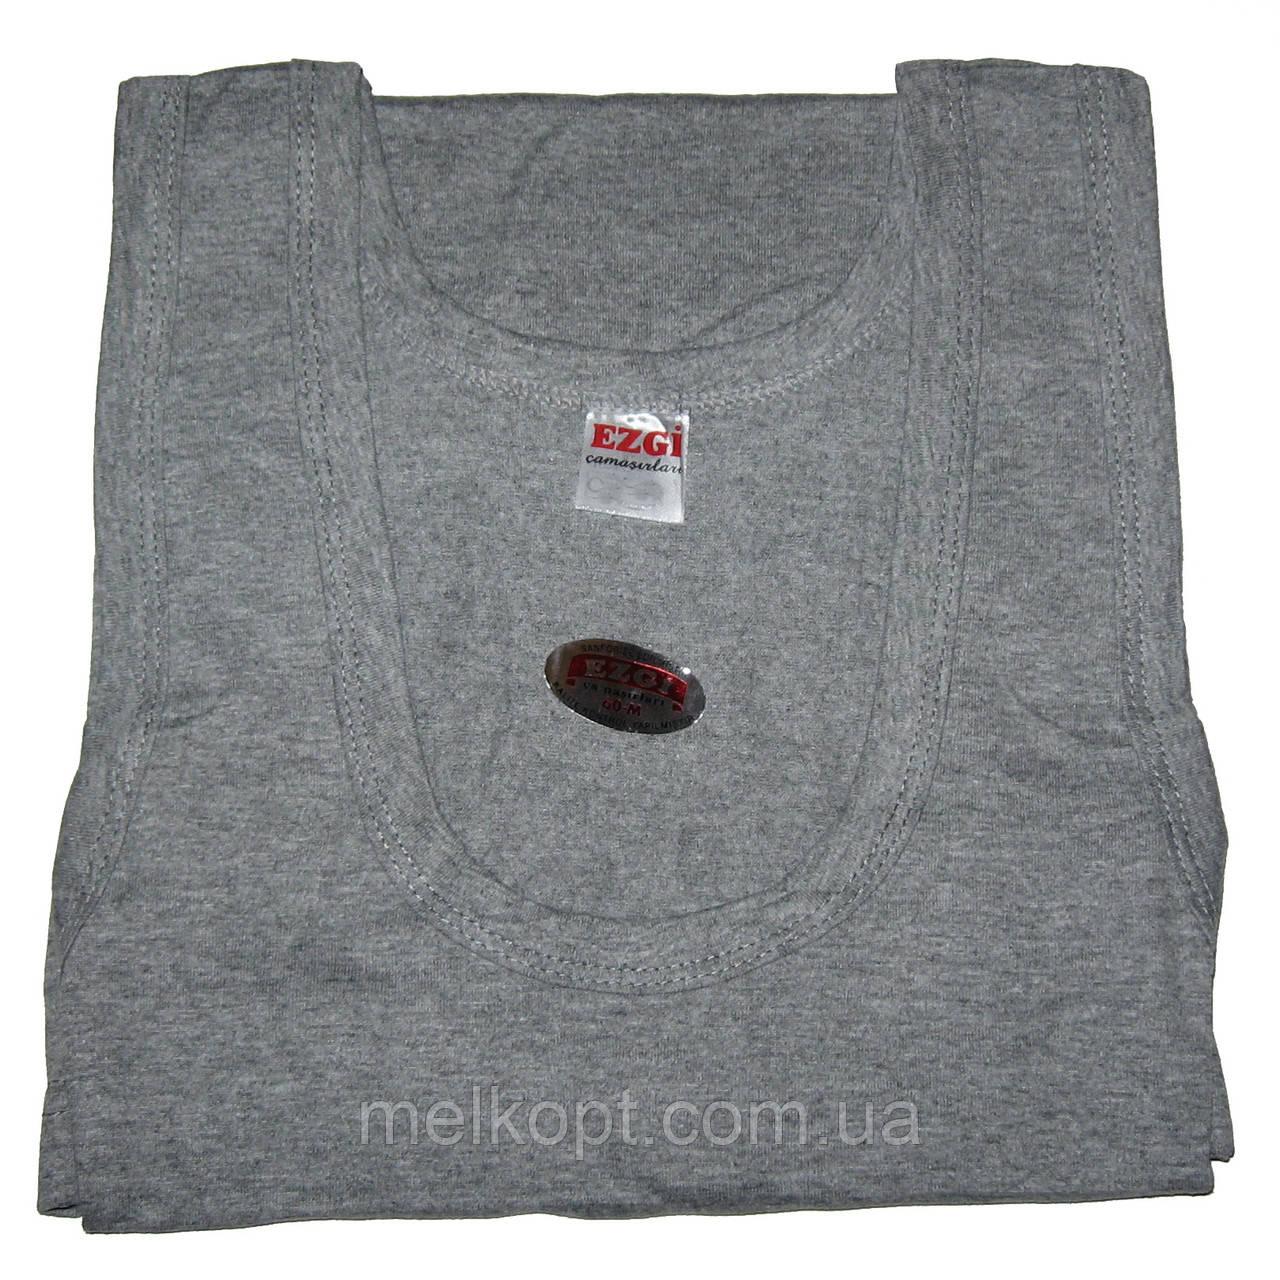 Мужские майки Ezgi - 53,00 грн./шт. (80-й размер, серые)